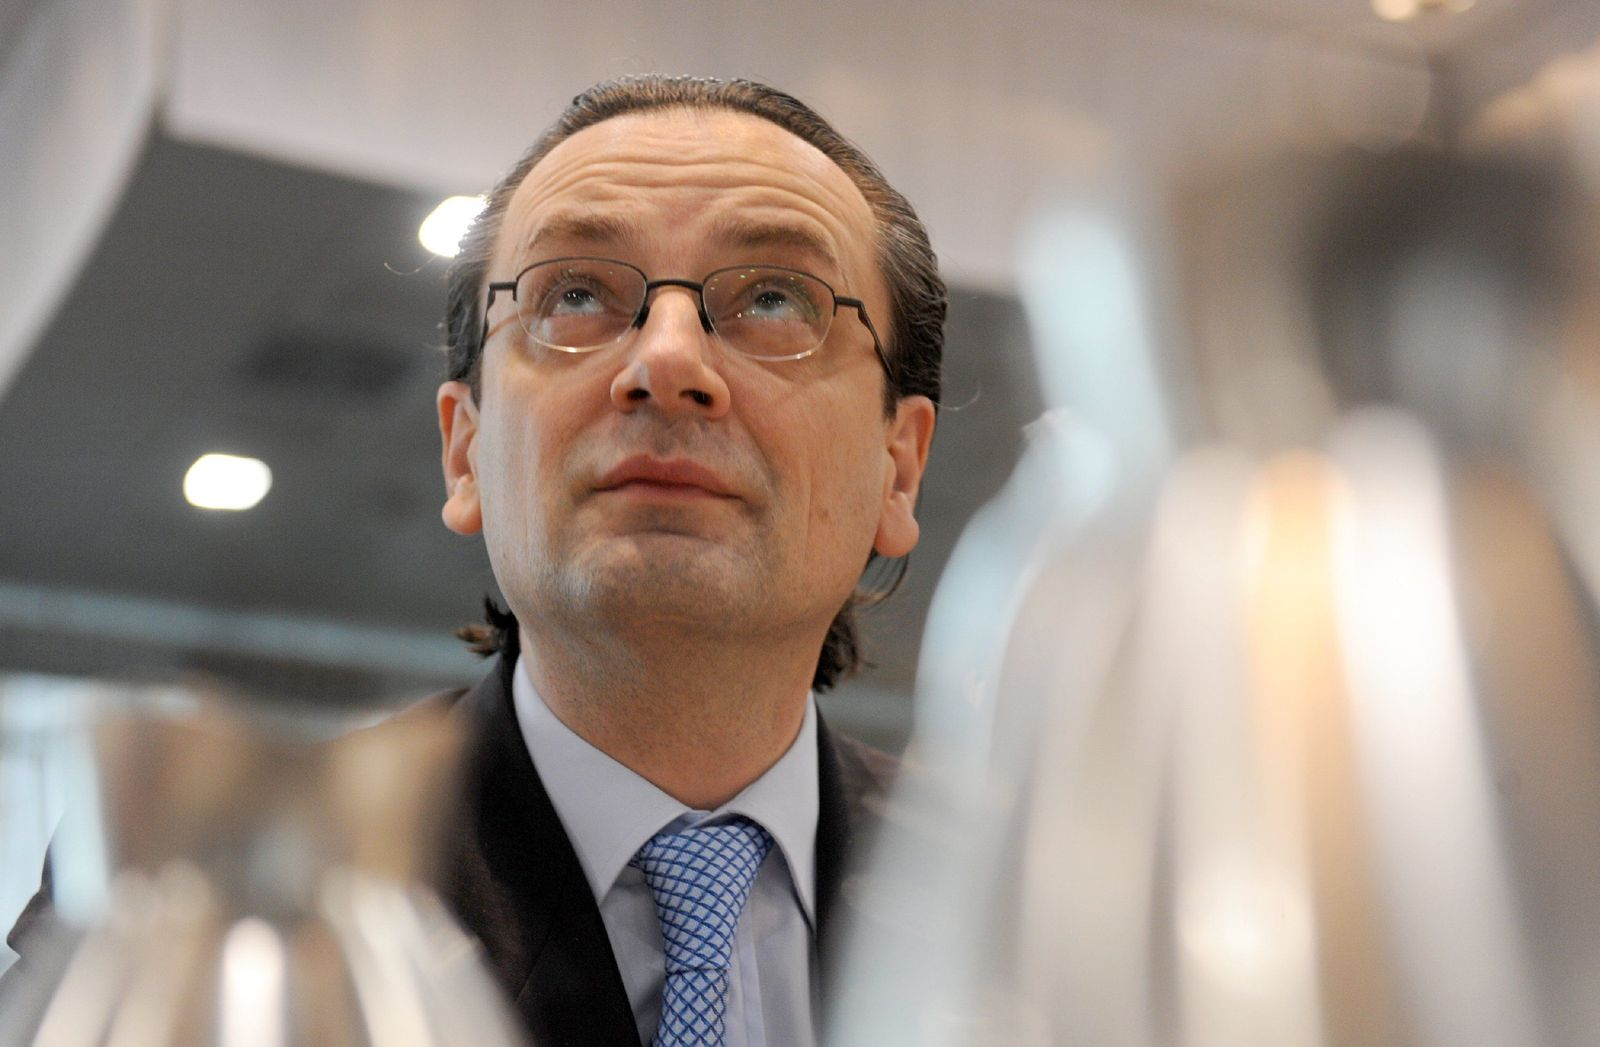 HSH Nordbank Dirk Nonnenmacher